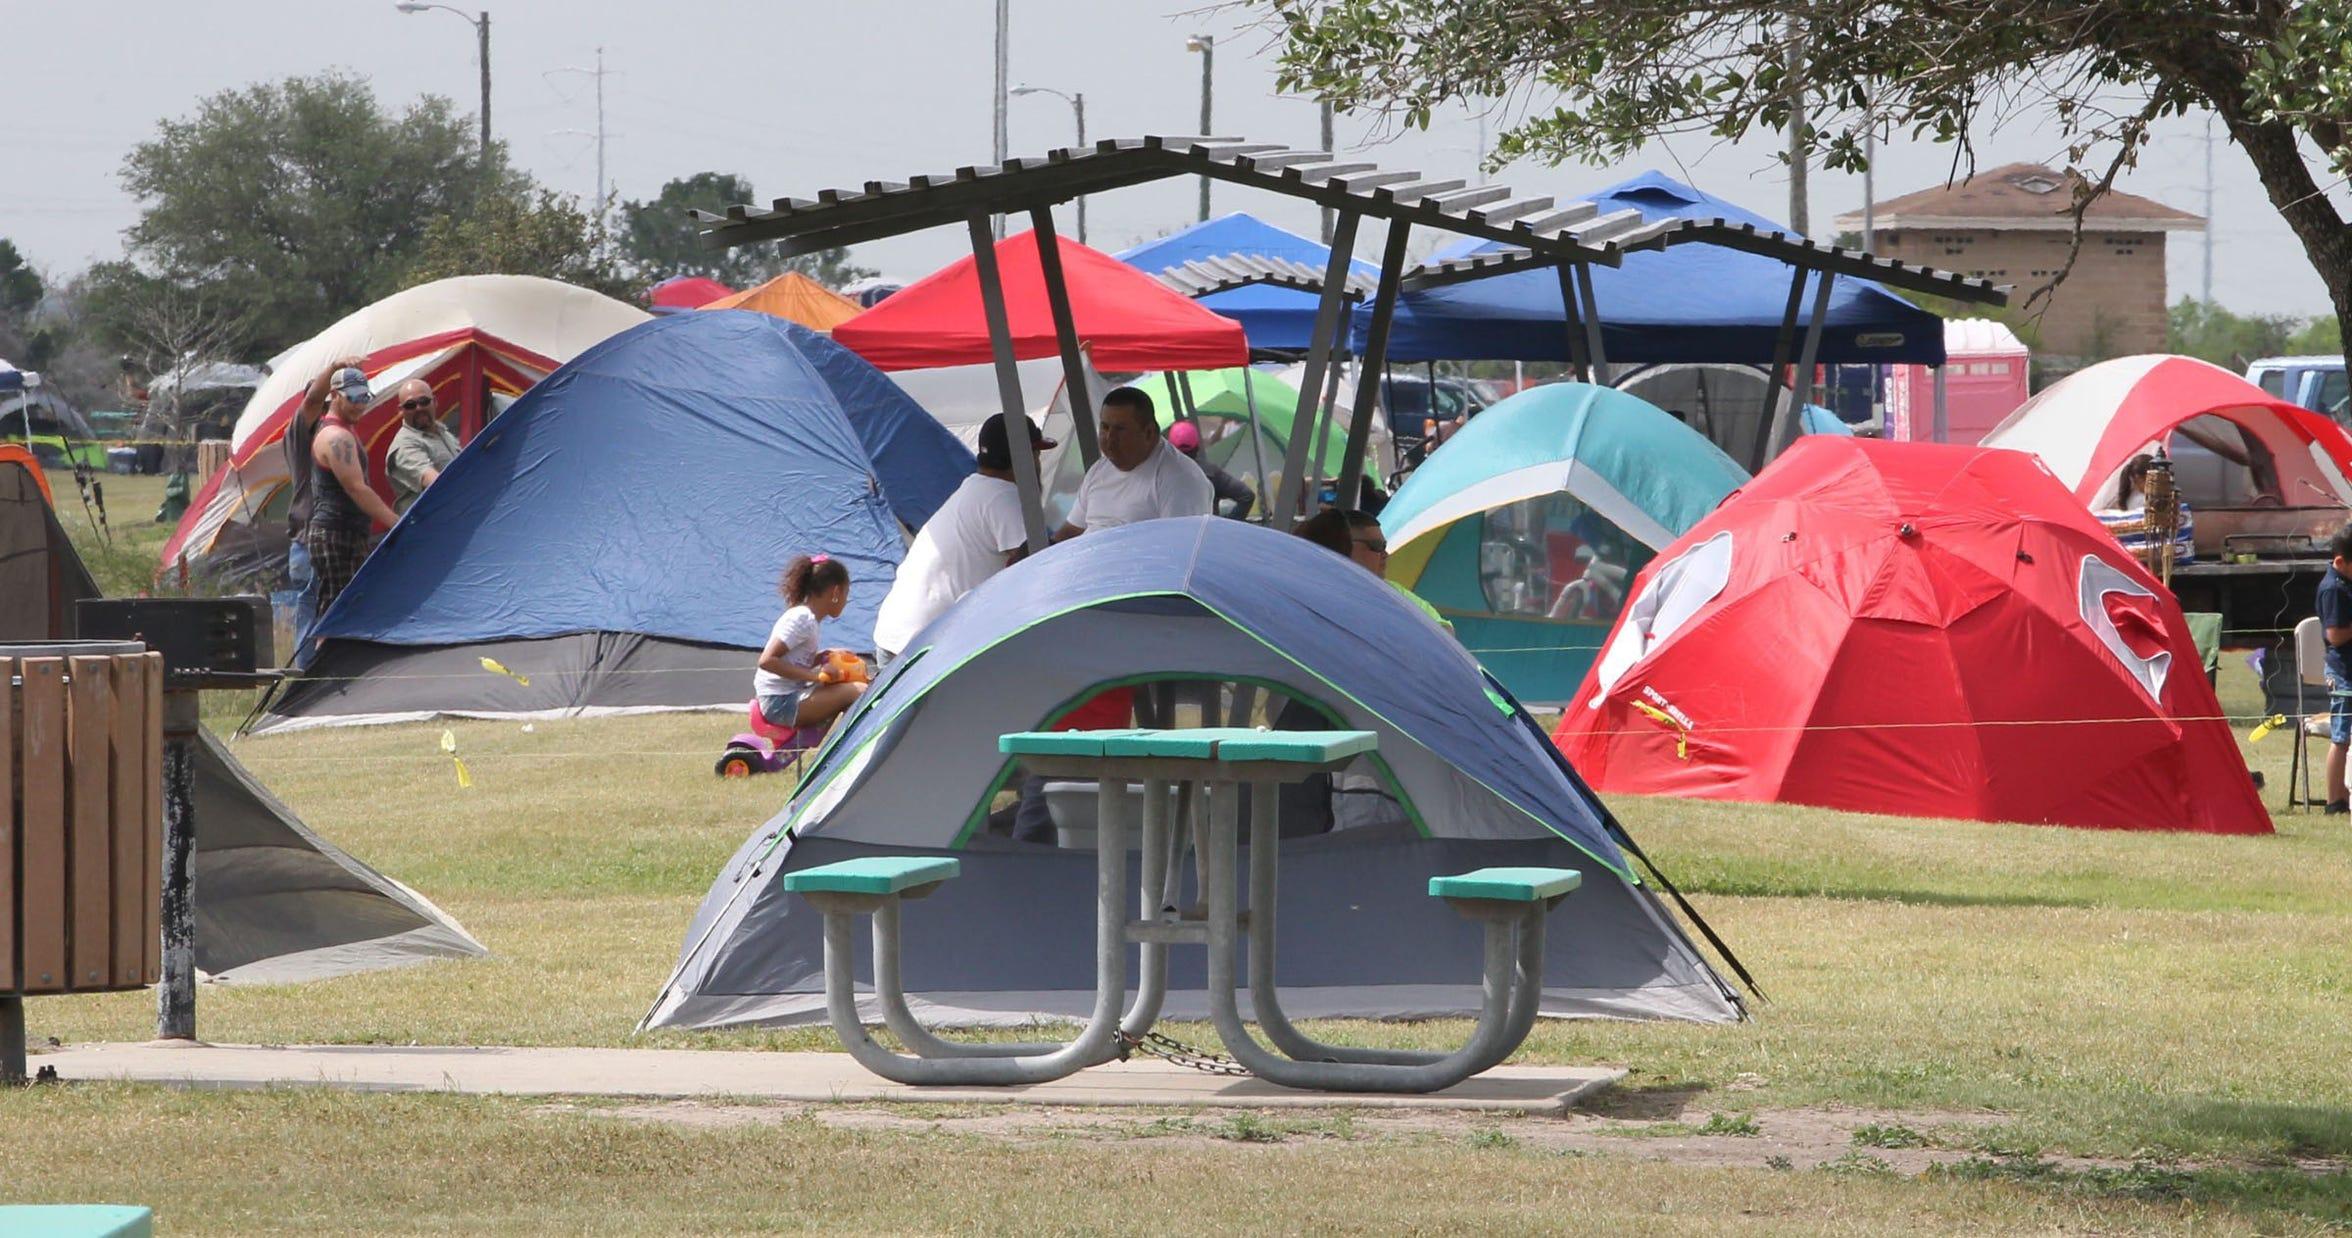 Tents dot the landscape at Labonte Park on April 19, 2014.